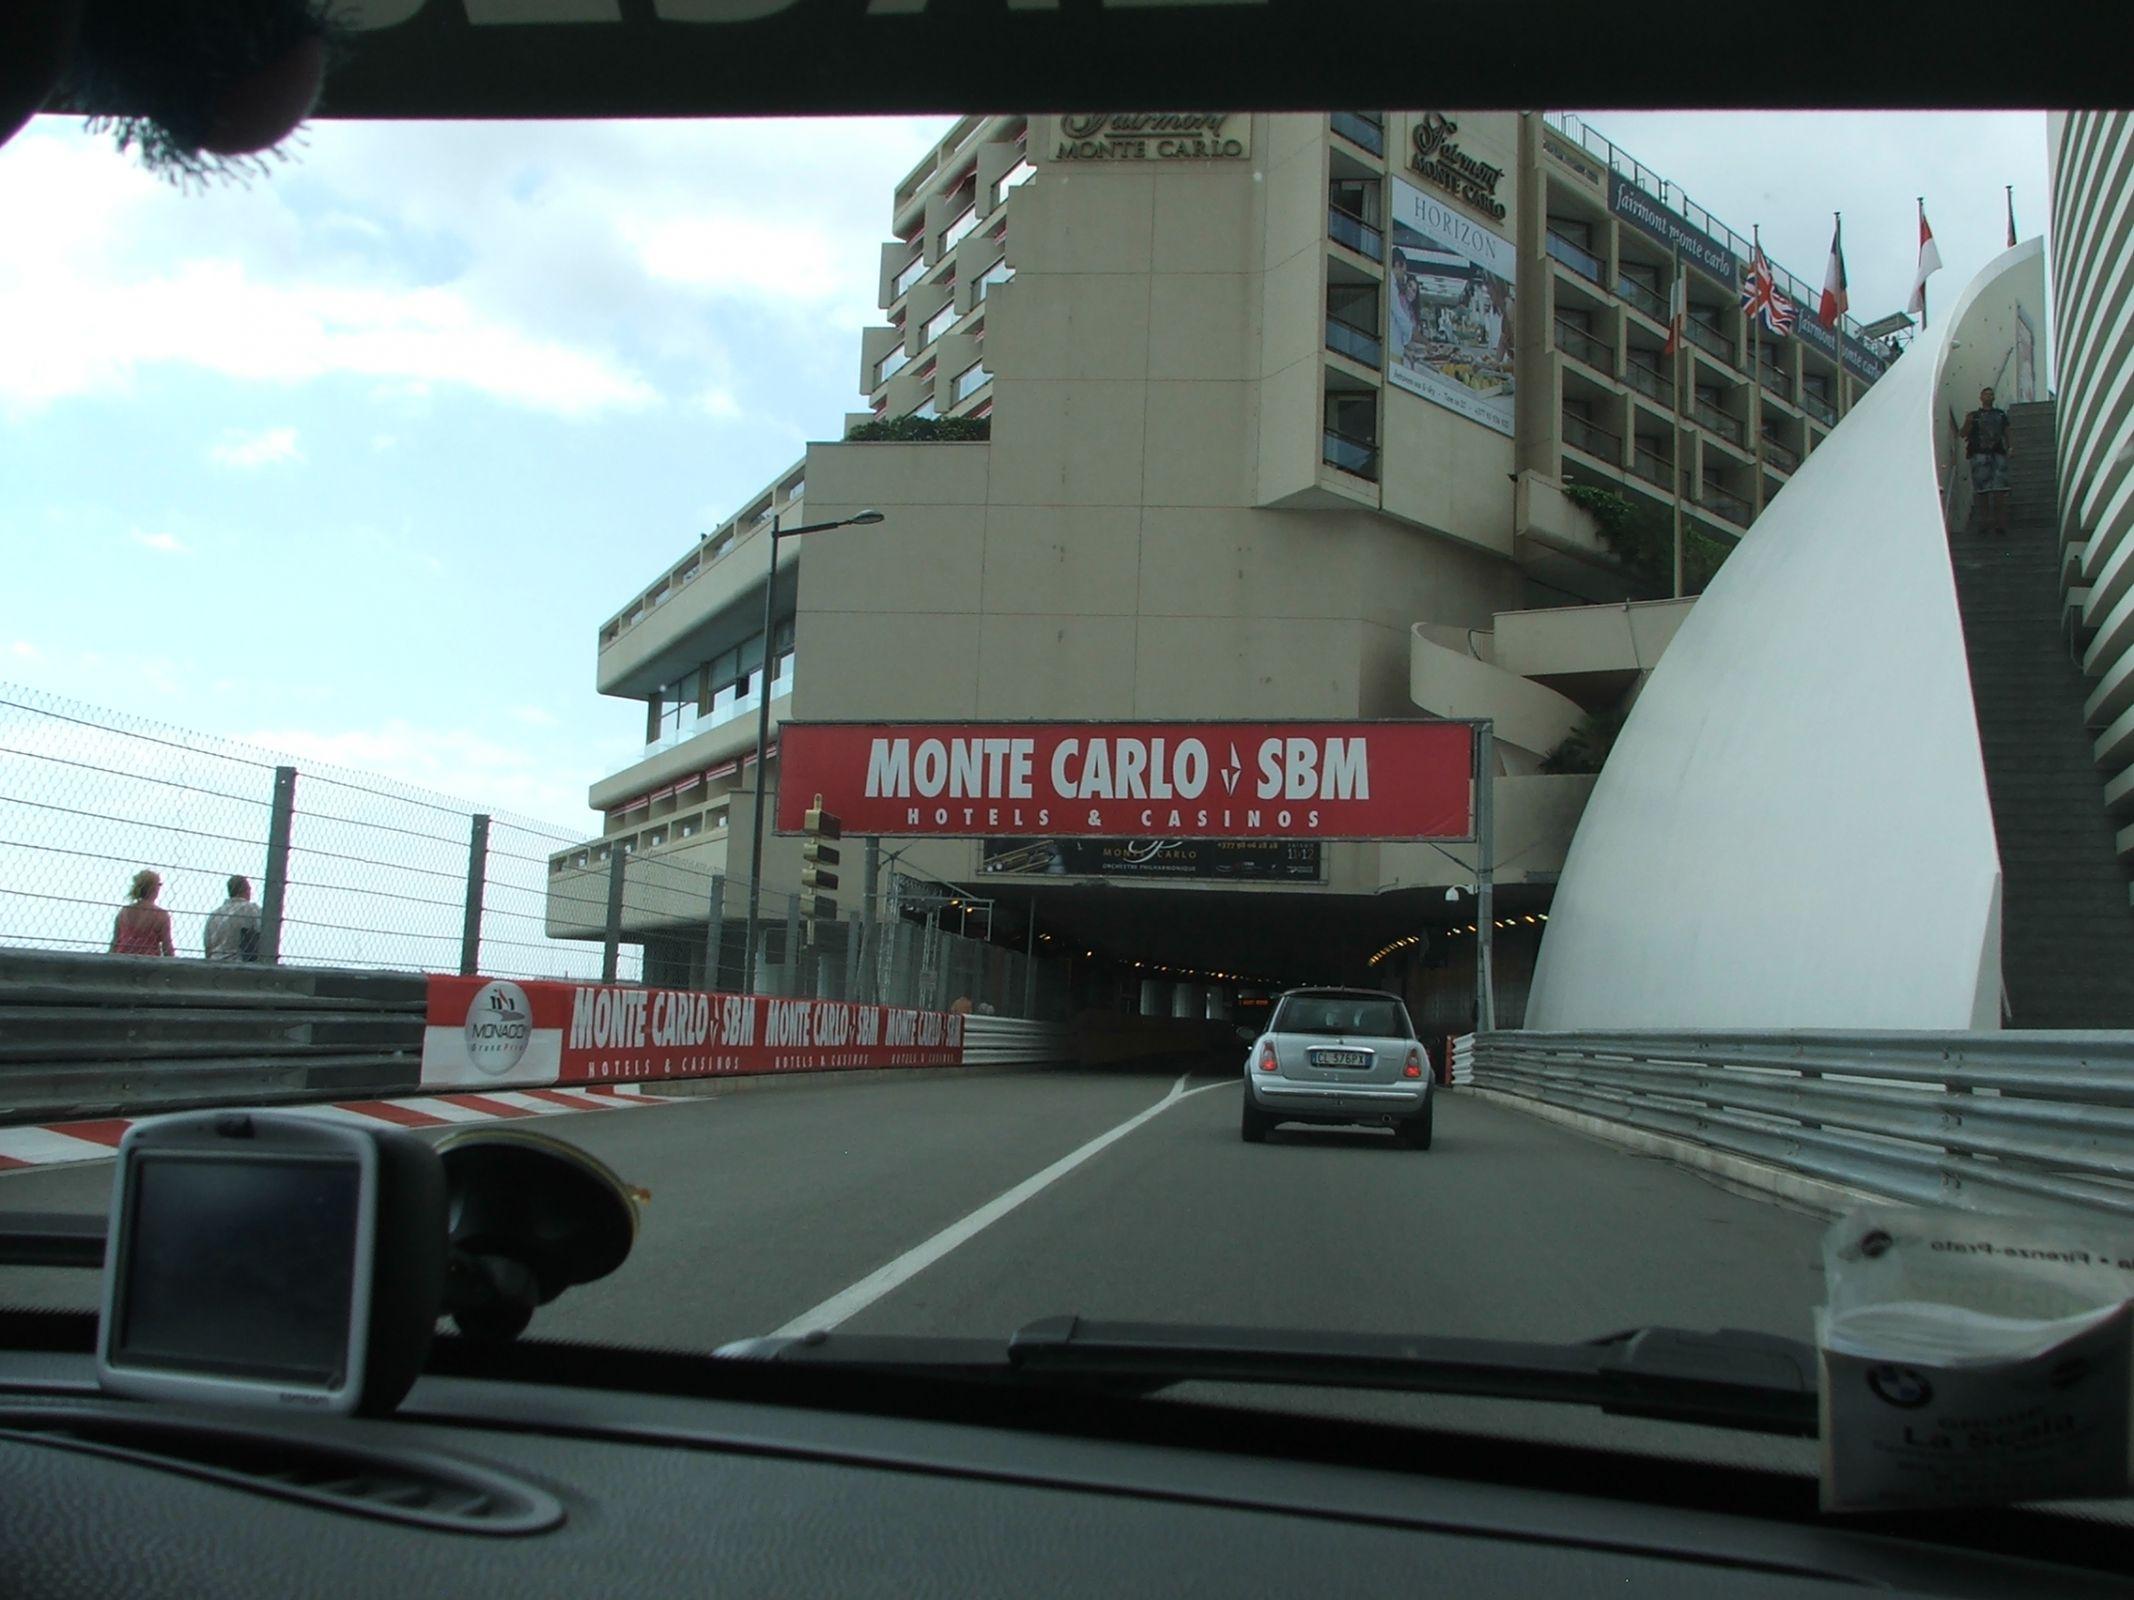 LMM @ Montecarlo